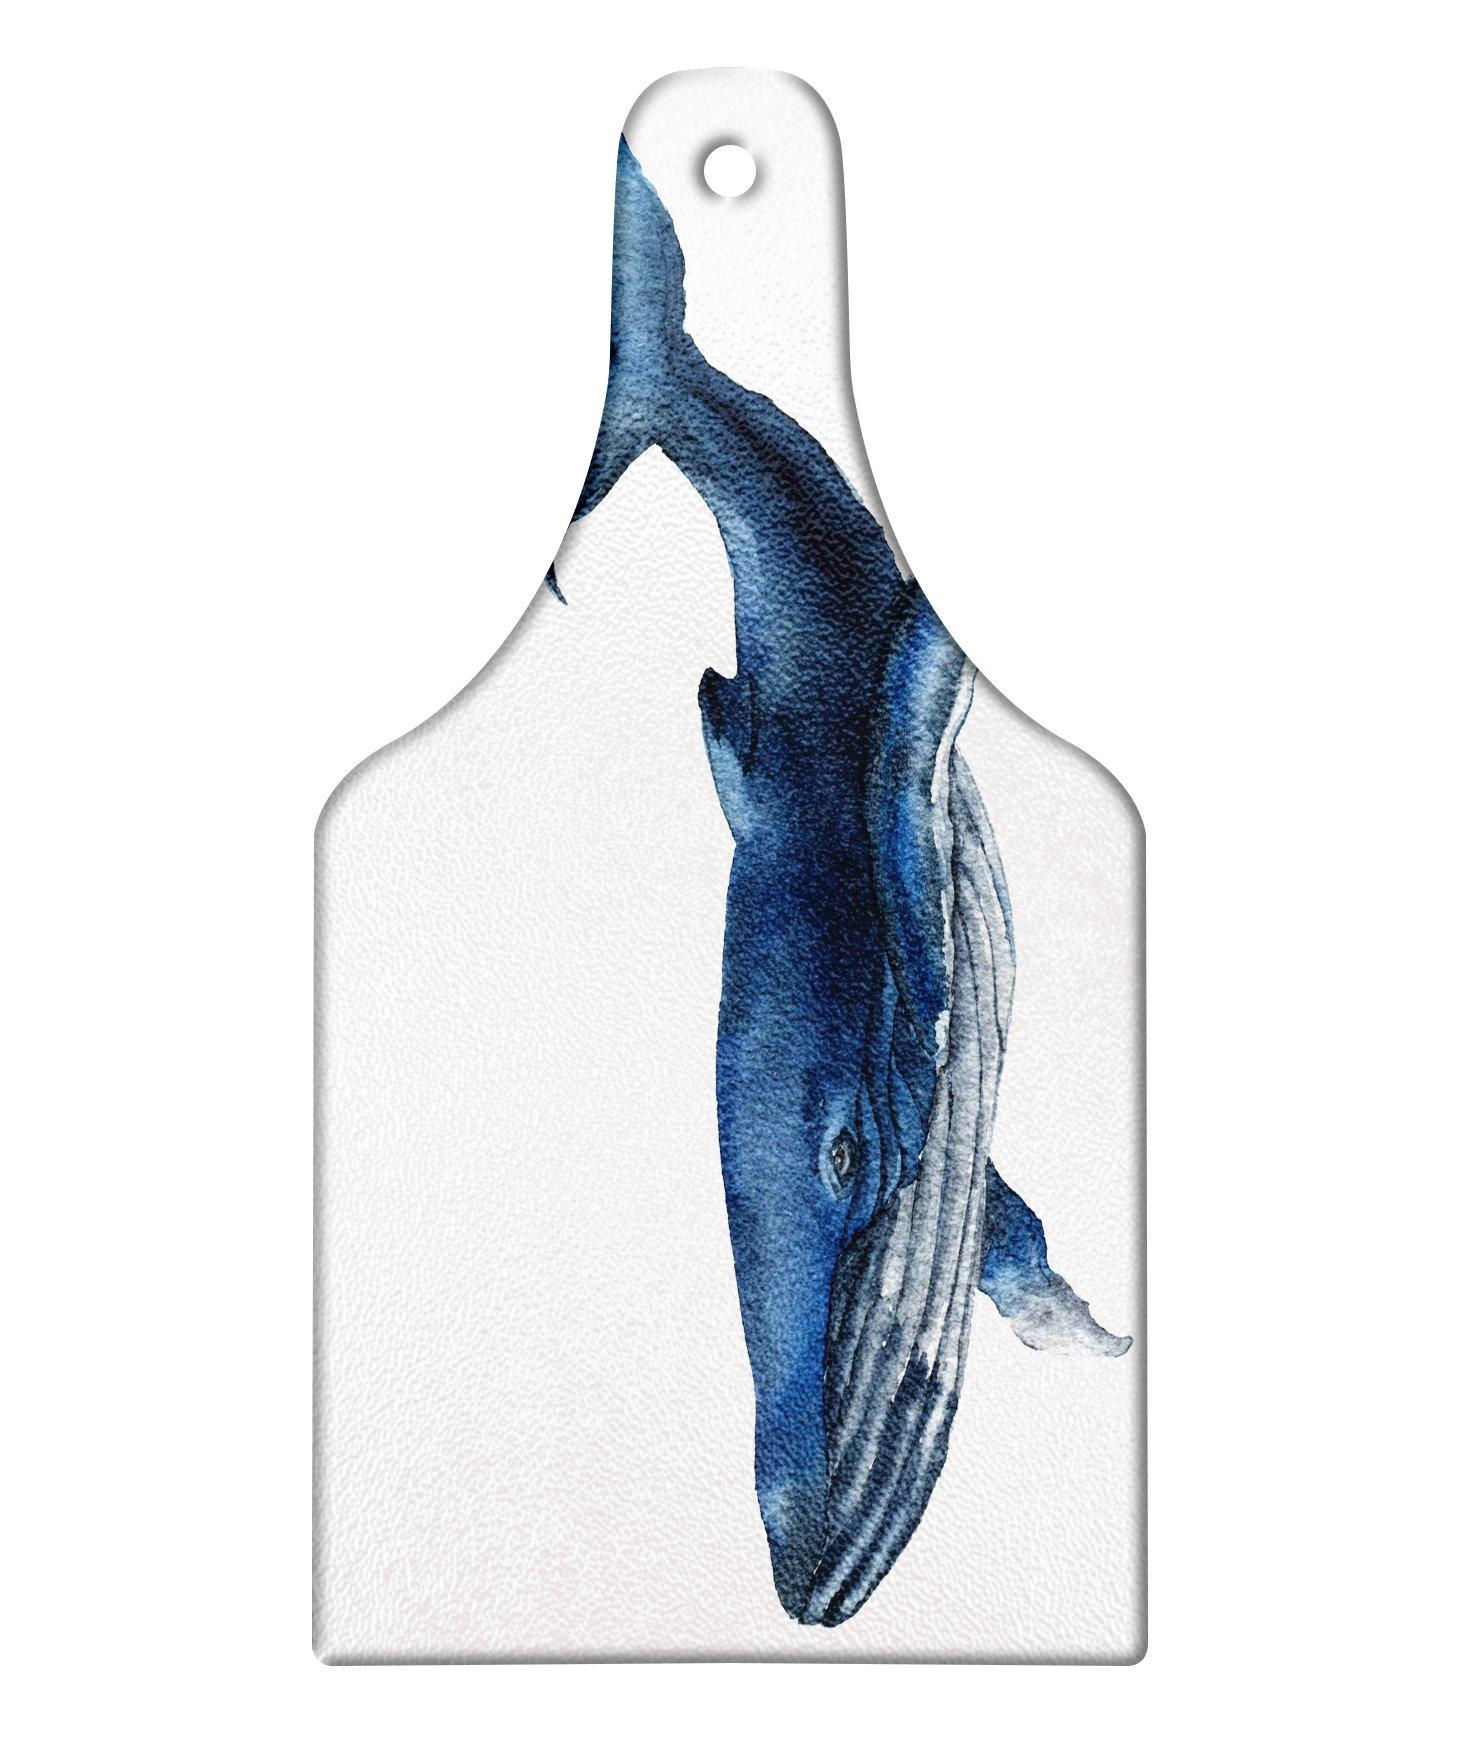 Lunarable Whale Cutting Board, Giant Fish Swimming Aquatic Marine Mammal Wildlife Defender Animal Artsy Display, Decorative Tempered Glass Cutting and Serving Board, Wine Bottle Shape, Dark Blue Grey